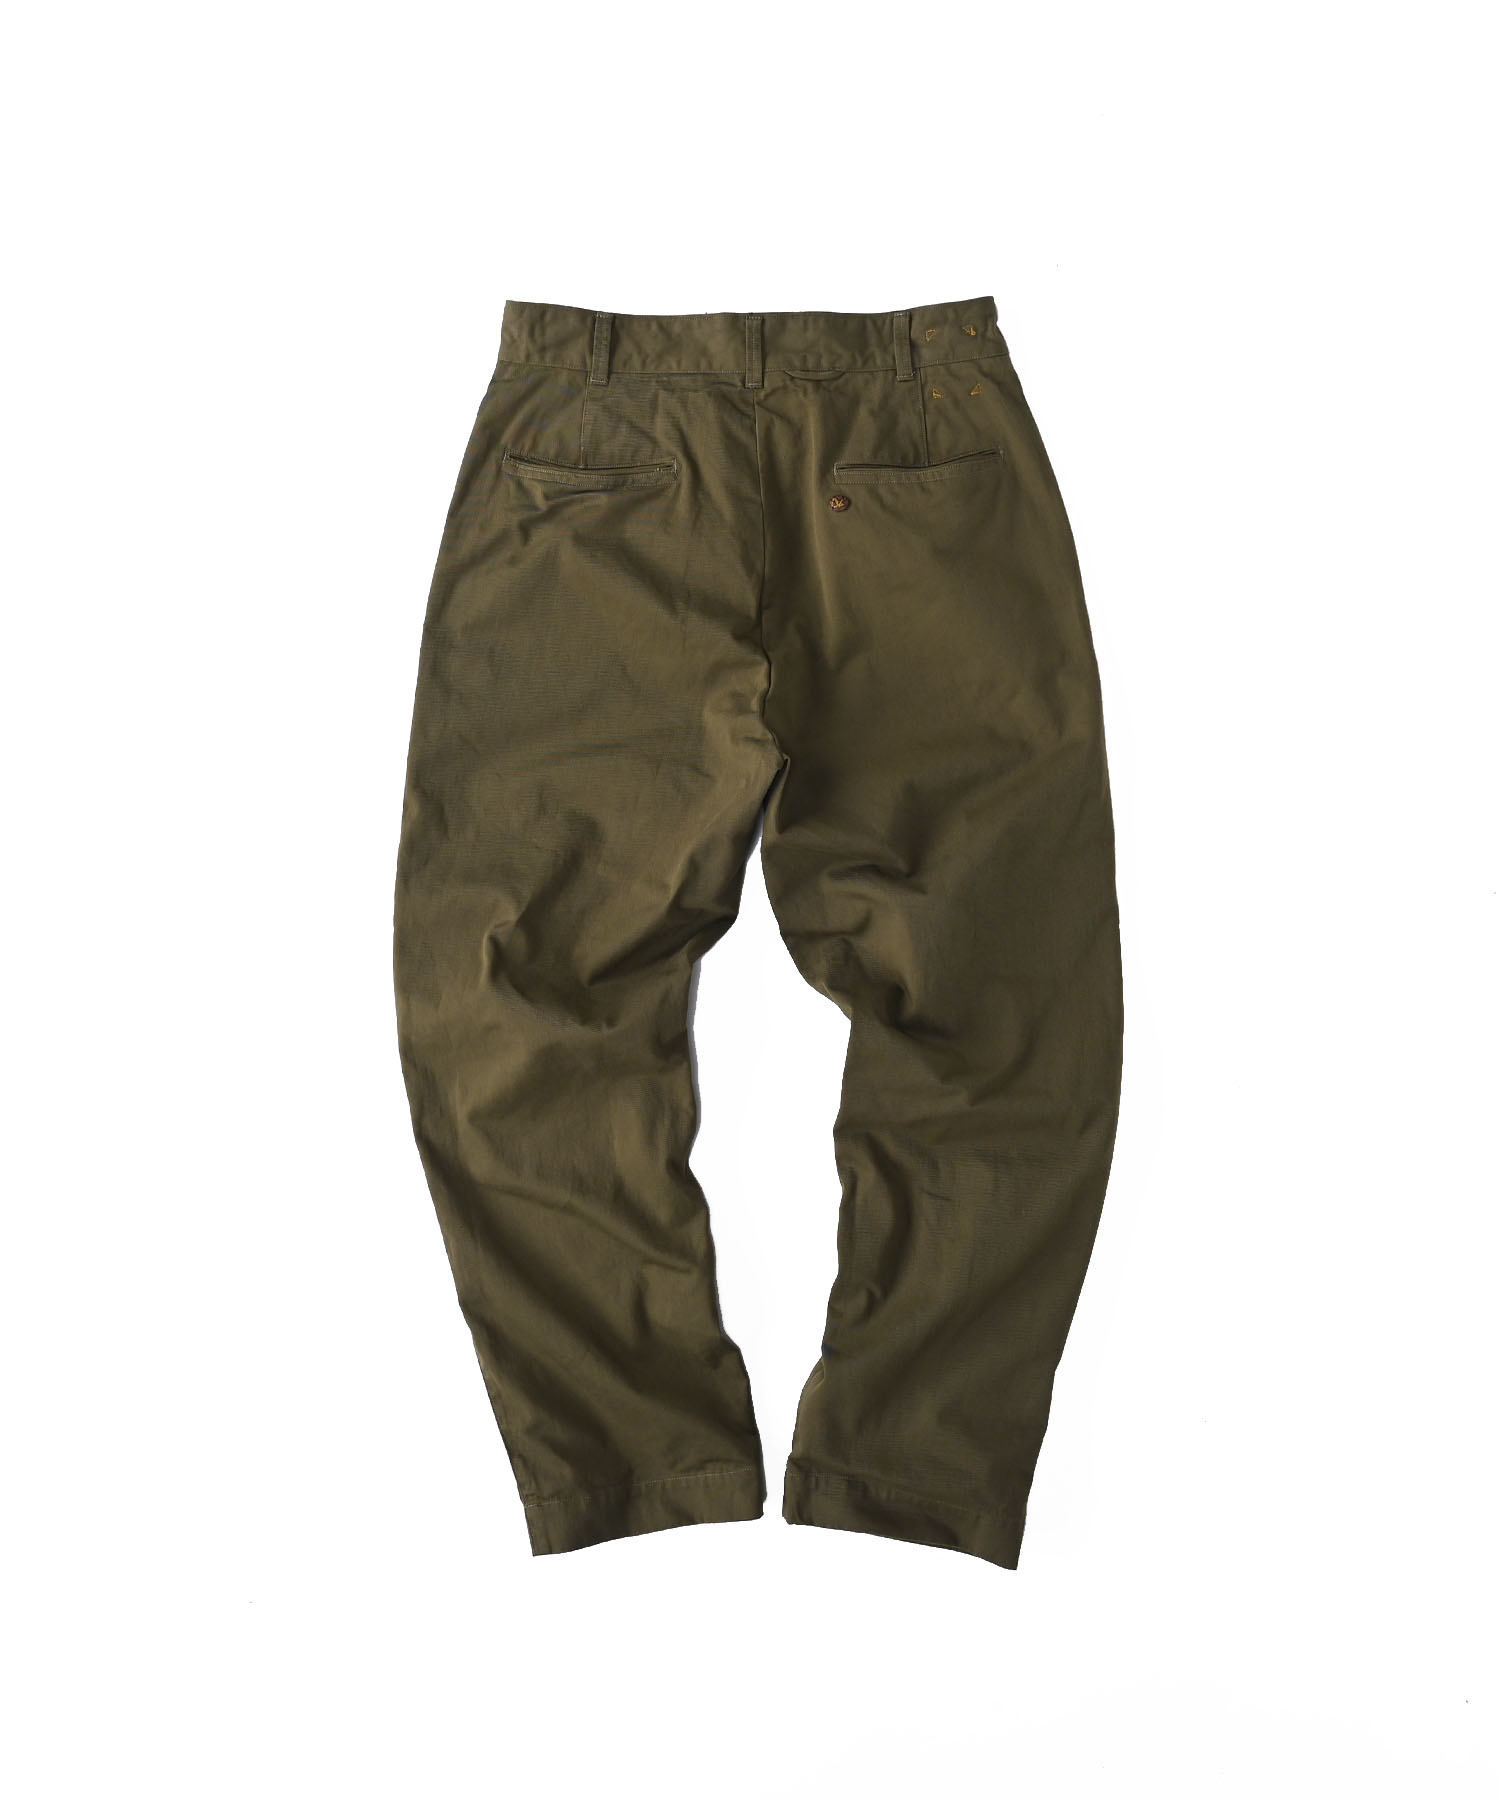 Okome Chino 908 Pants (0421)-3